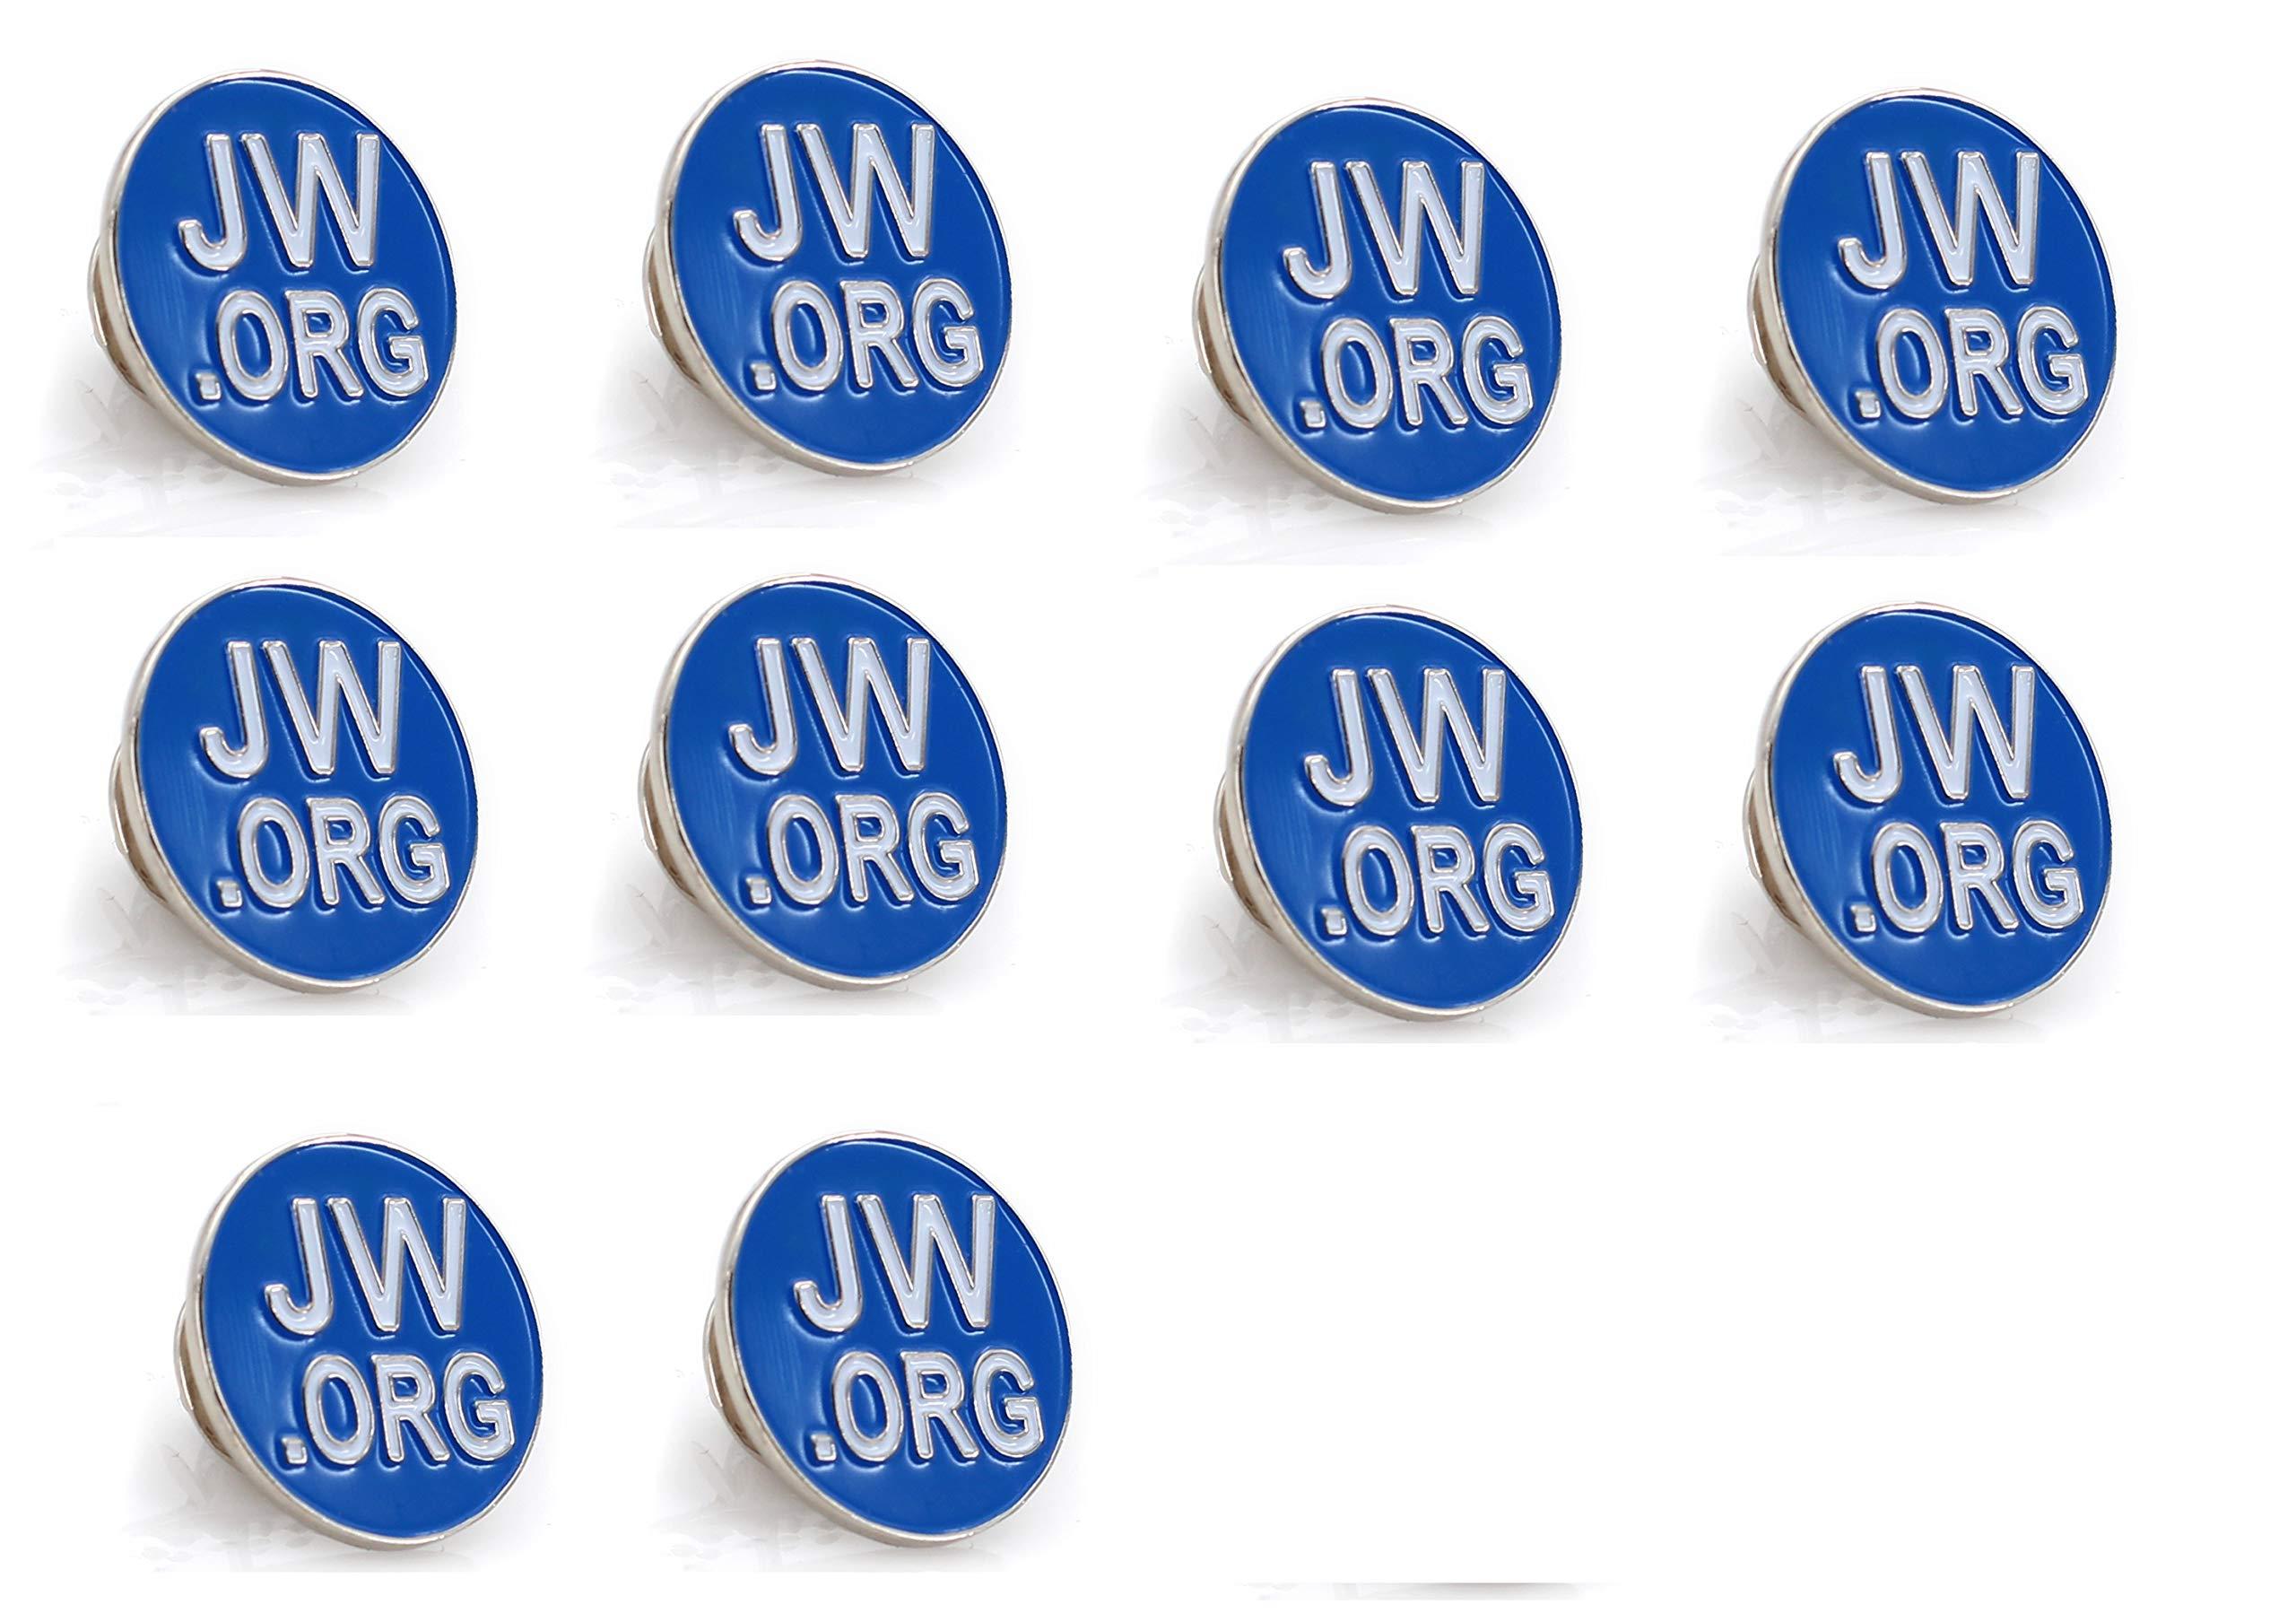 Jehovah Witness - JW.Org 翻领别针 - JW.org 领带帽 Tack Clip 女士或男士西装-圆形或方形 Silver Round Pin-10 Pcs